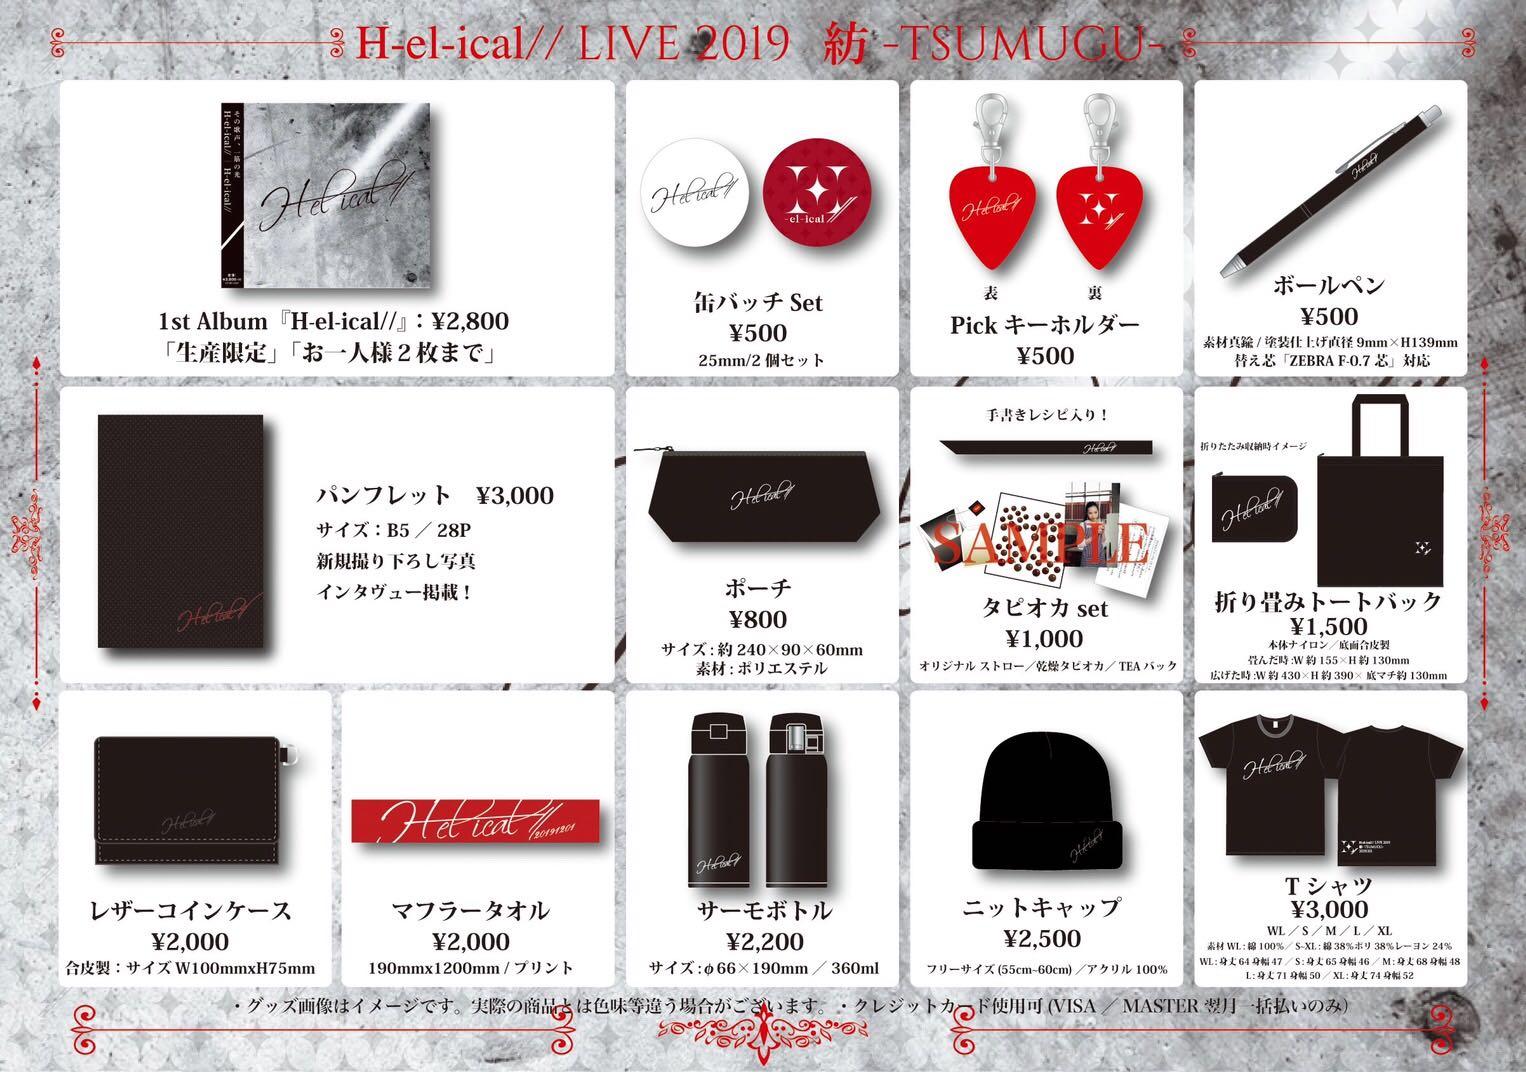 H-el-ical// LIVE 2019「紡-TSUMUGU-」会場販売グッズのお知らせ